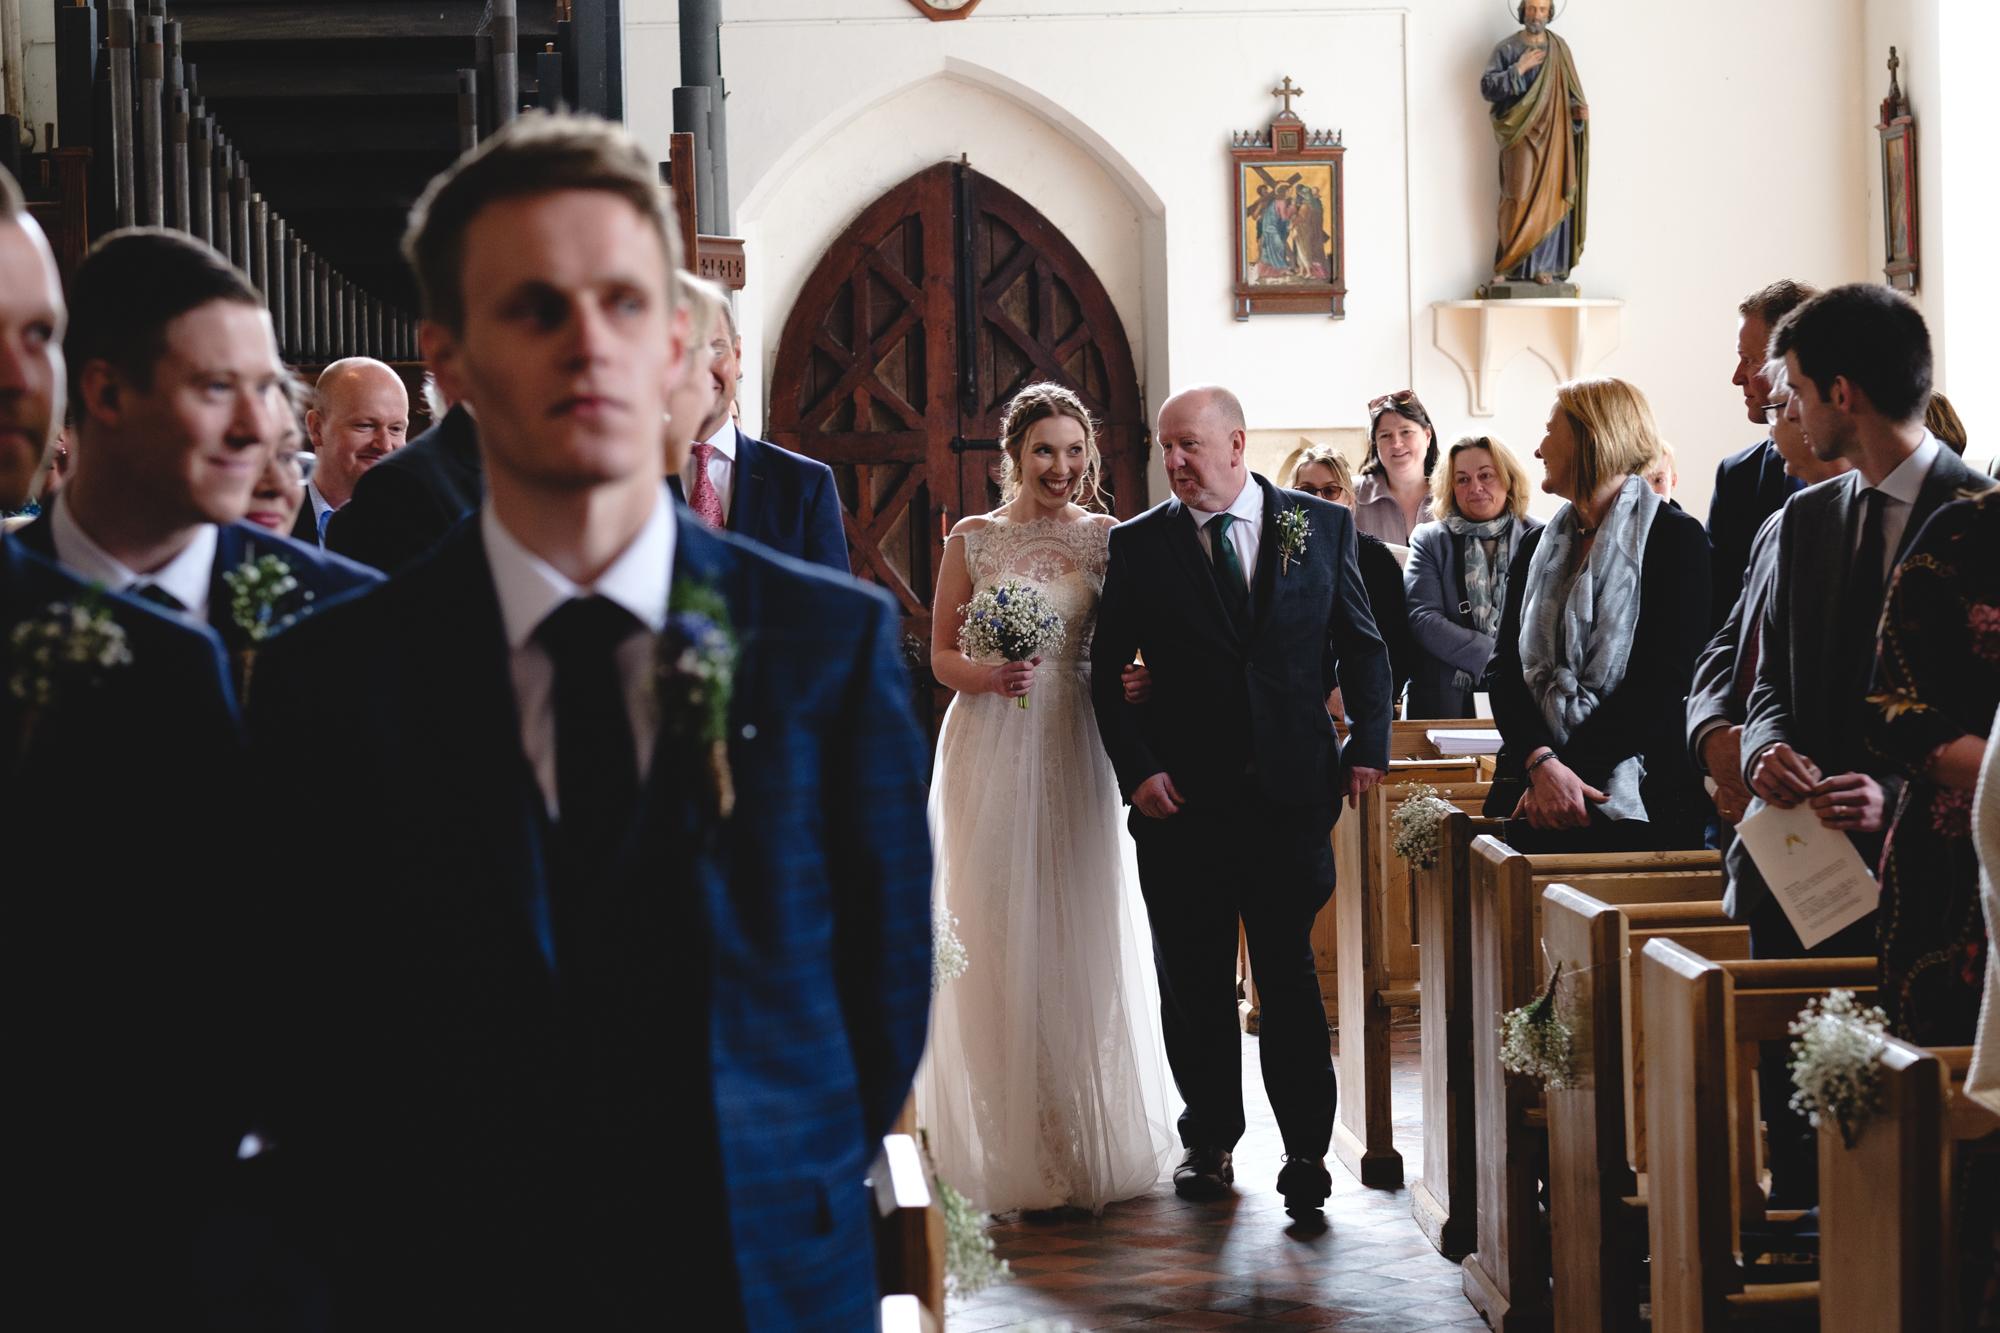 Katie and Dode weddings (46 of 207).jpg